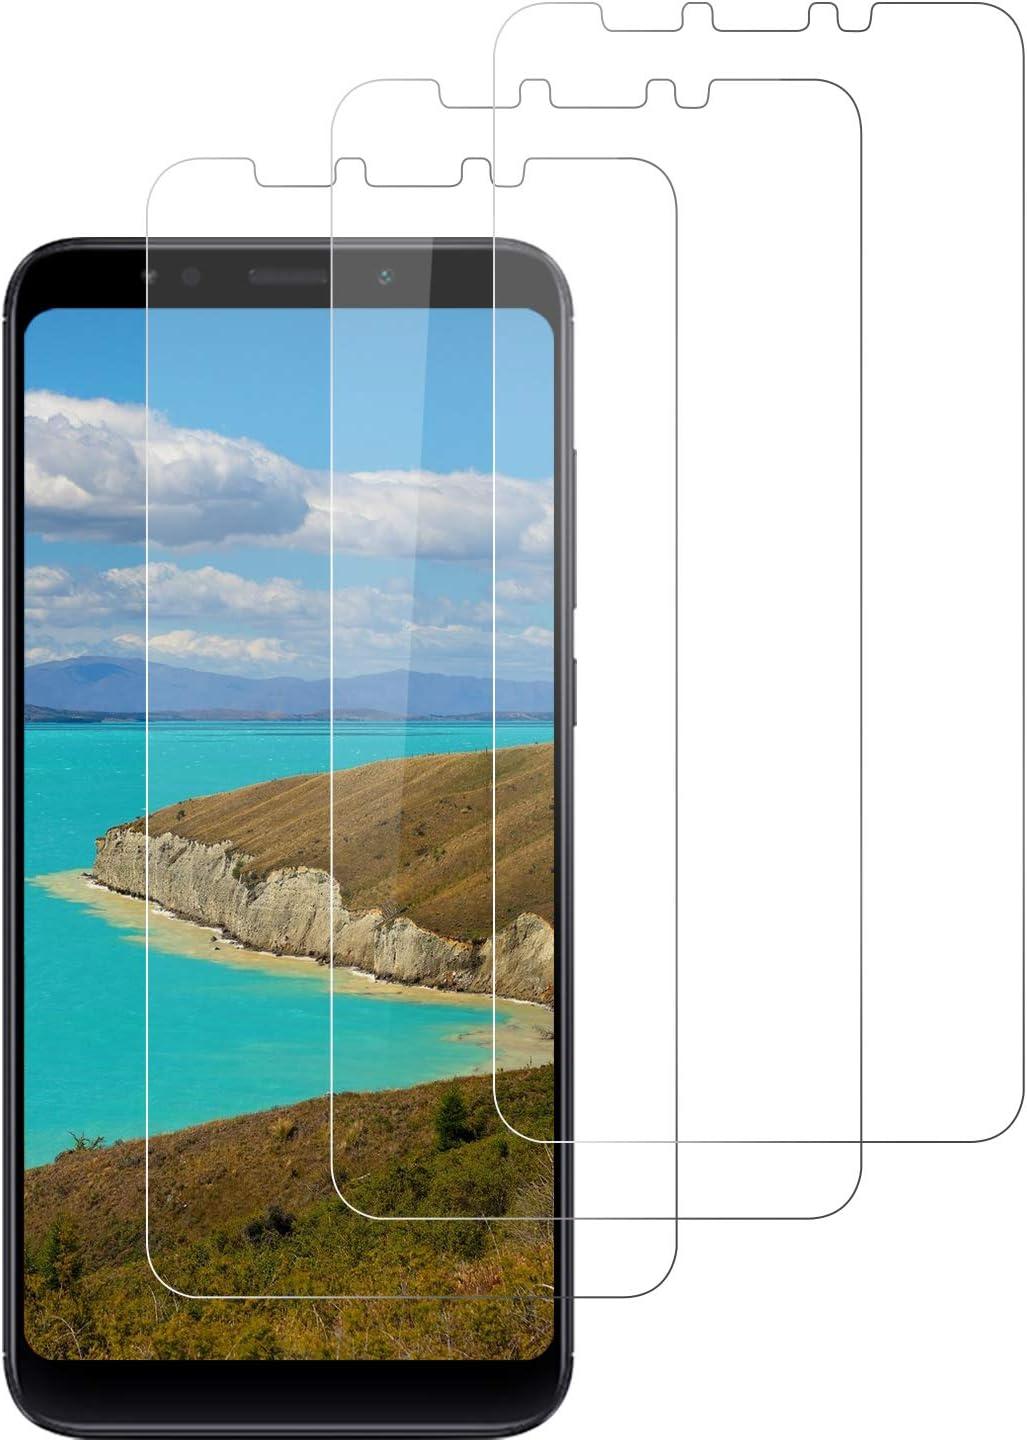 DOSNTO 3 Pack Protector de Pantalla para Xiaomi Redmi 5 Plus, Cristal Templado para Redmi 5 Plus 9H Dureza, Sin Burbujas,Anti-Huella, Resistente a Arañazos y Golpes, Fácil de Instalar - Transparente